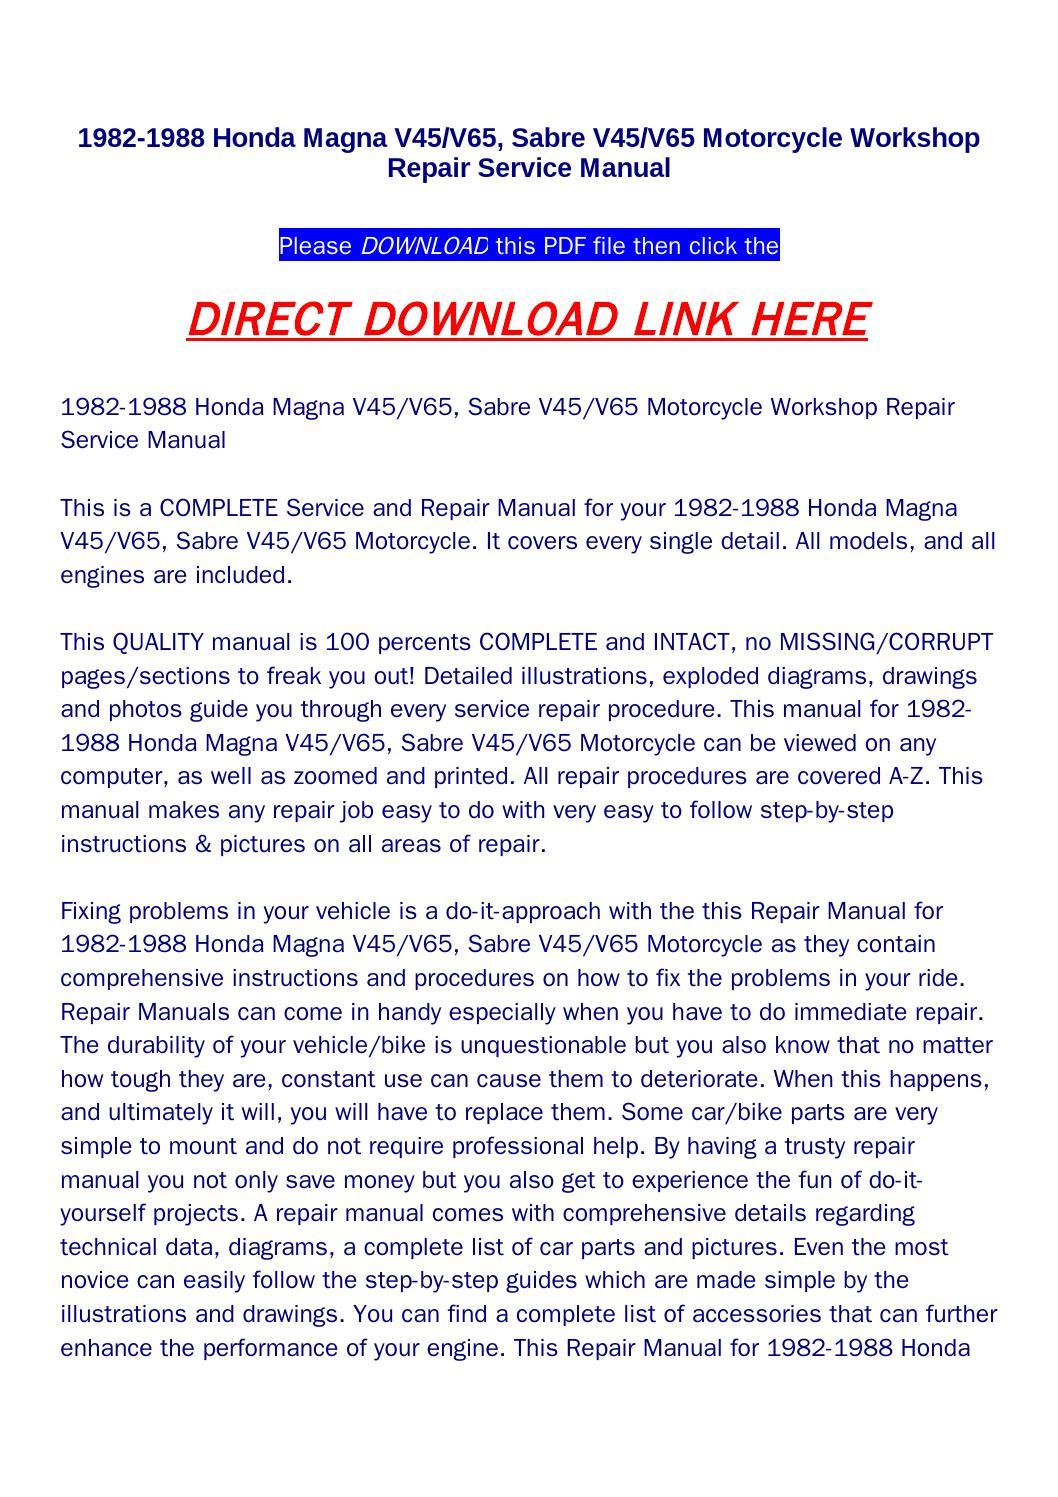 Honda v65 Magna repair manual on